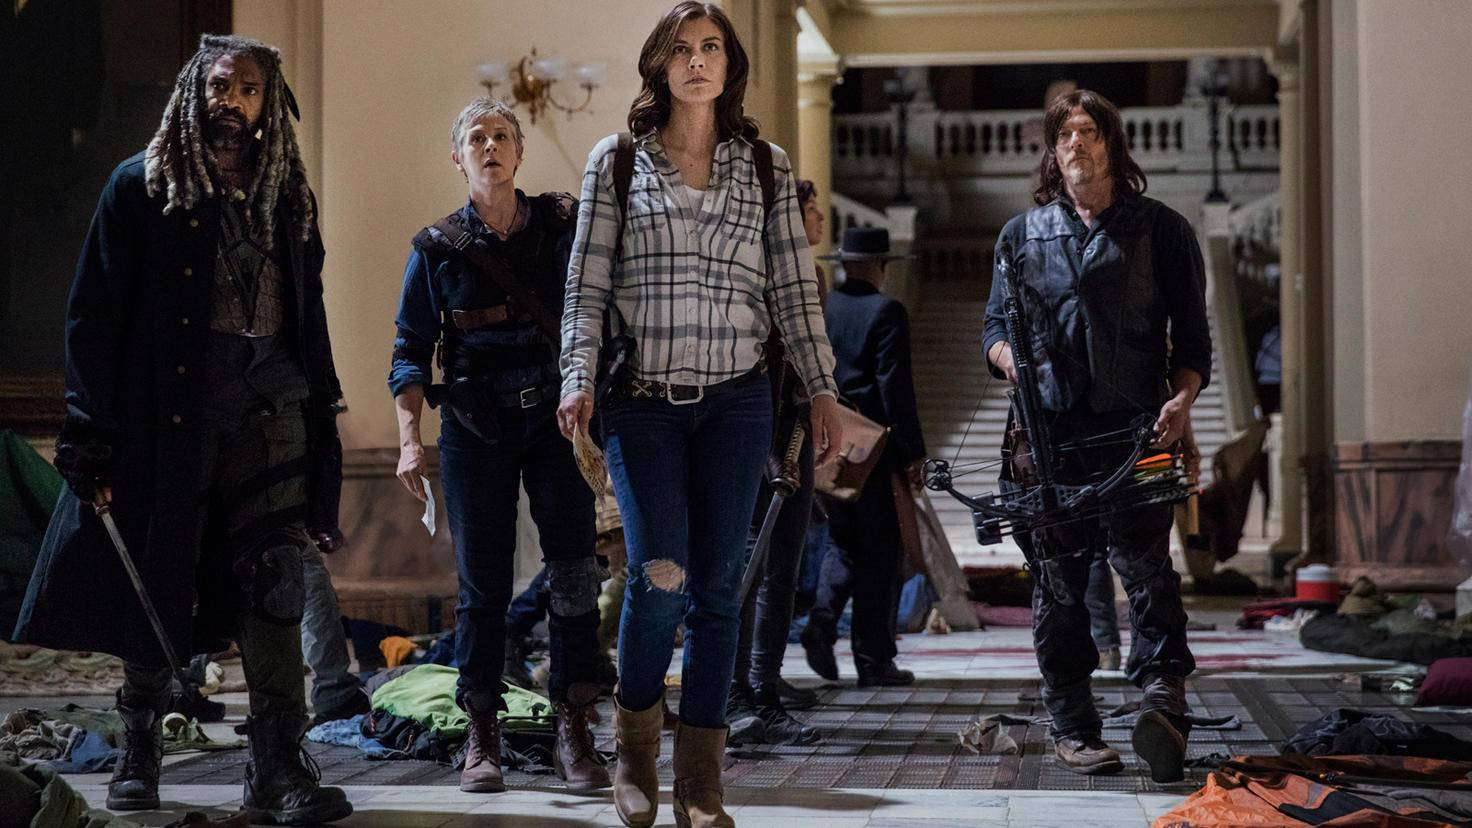 The Walking Dead-S09E01-Ezekiel-Carol-Maggie-Daryl-Jackson Lee Davis-AMC